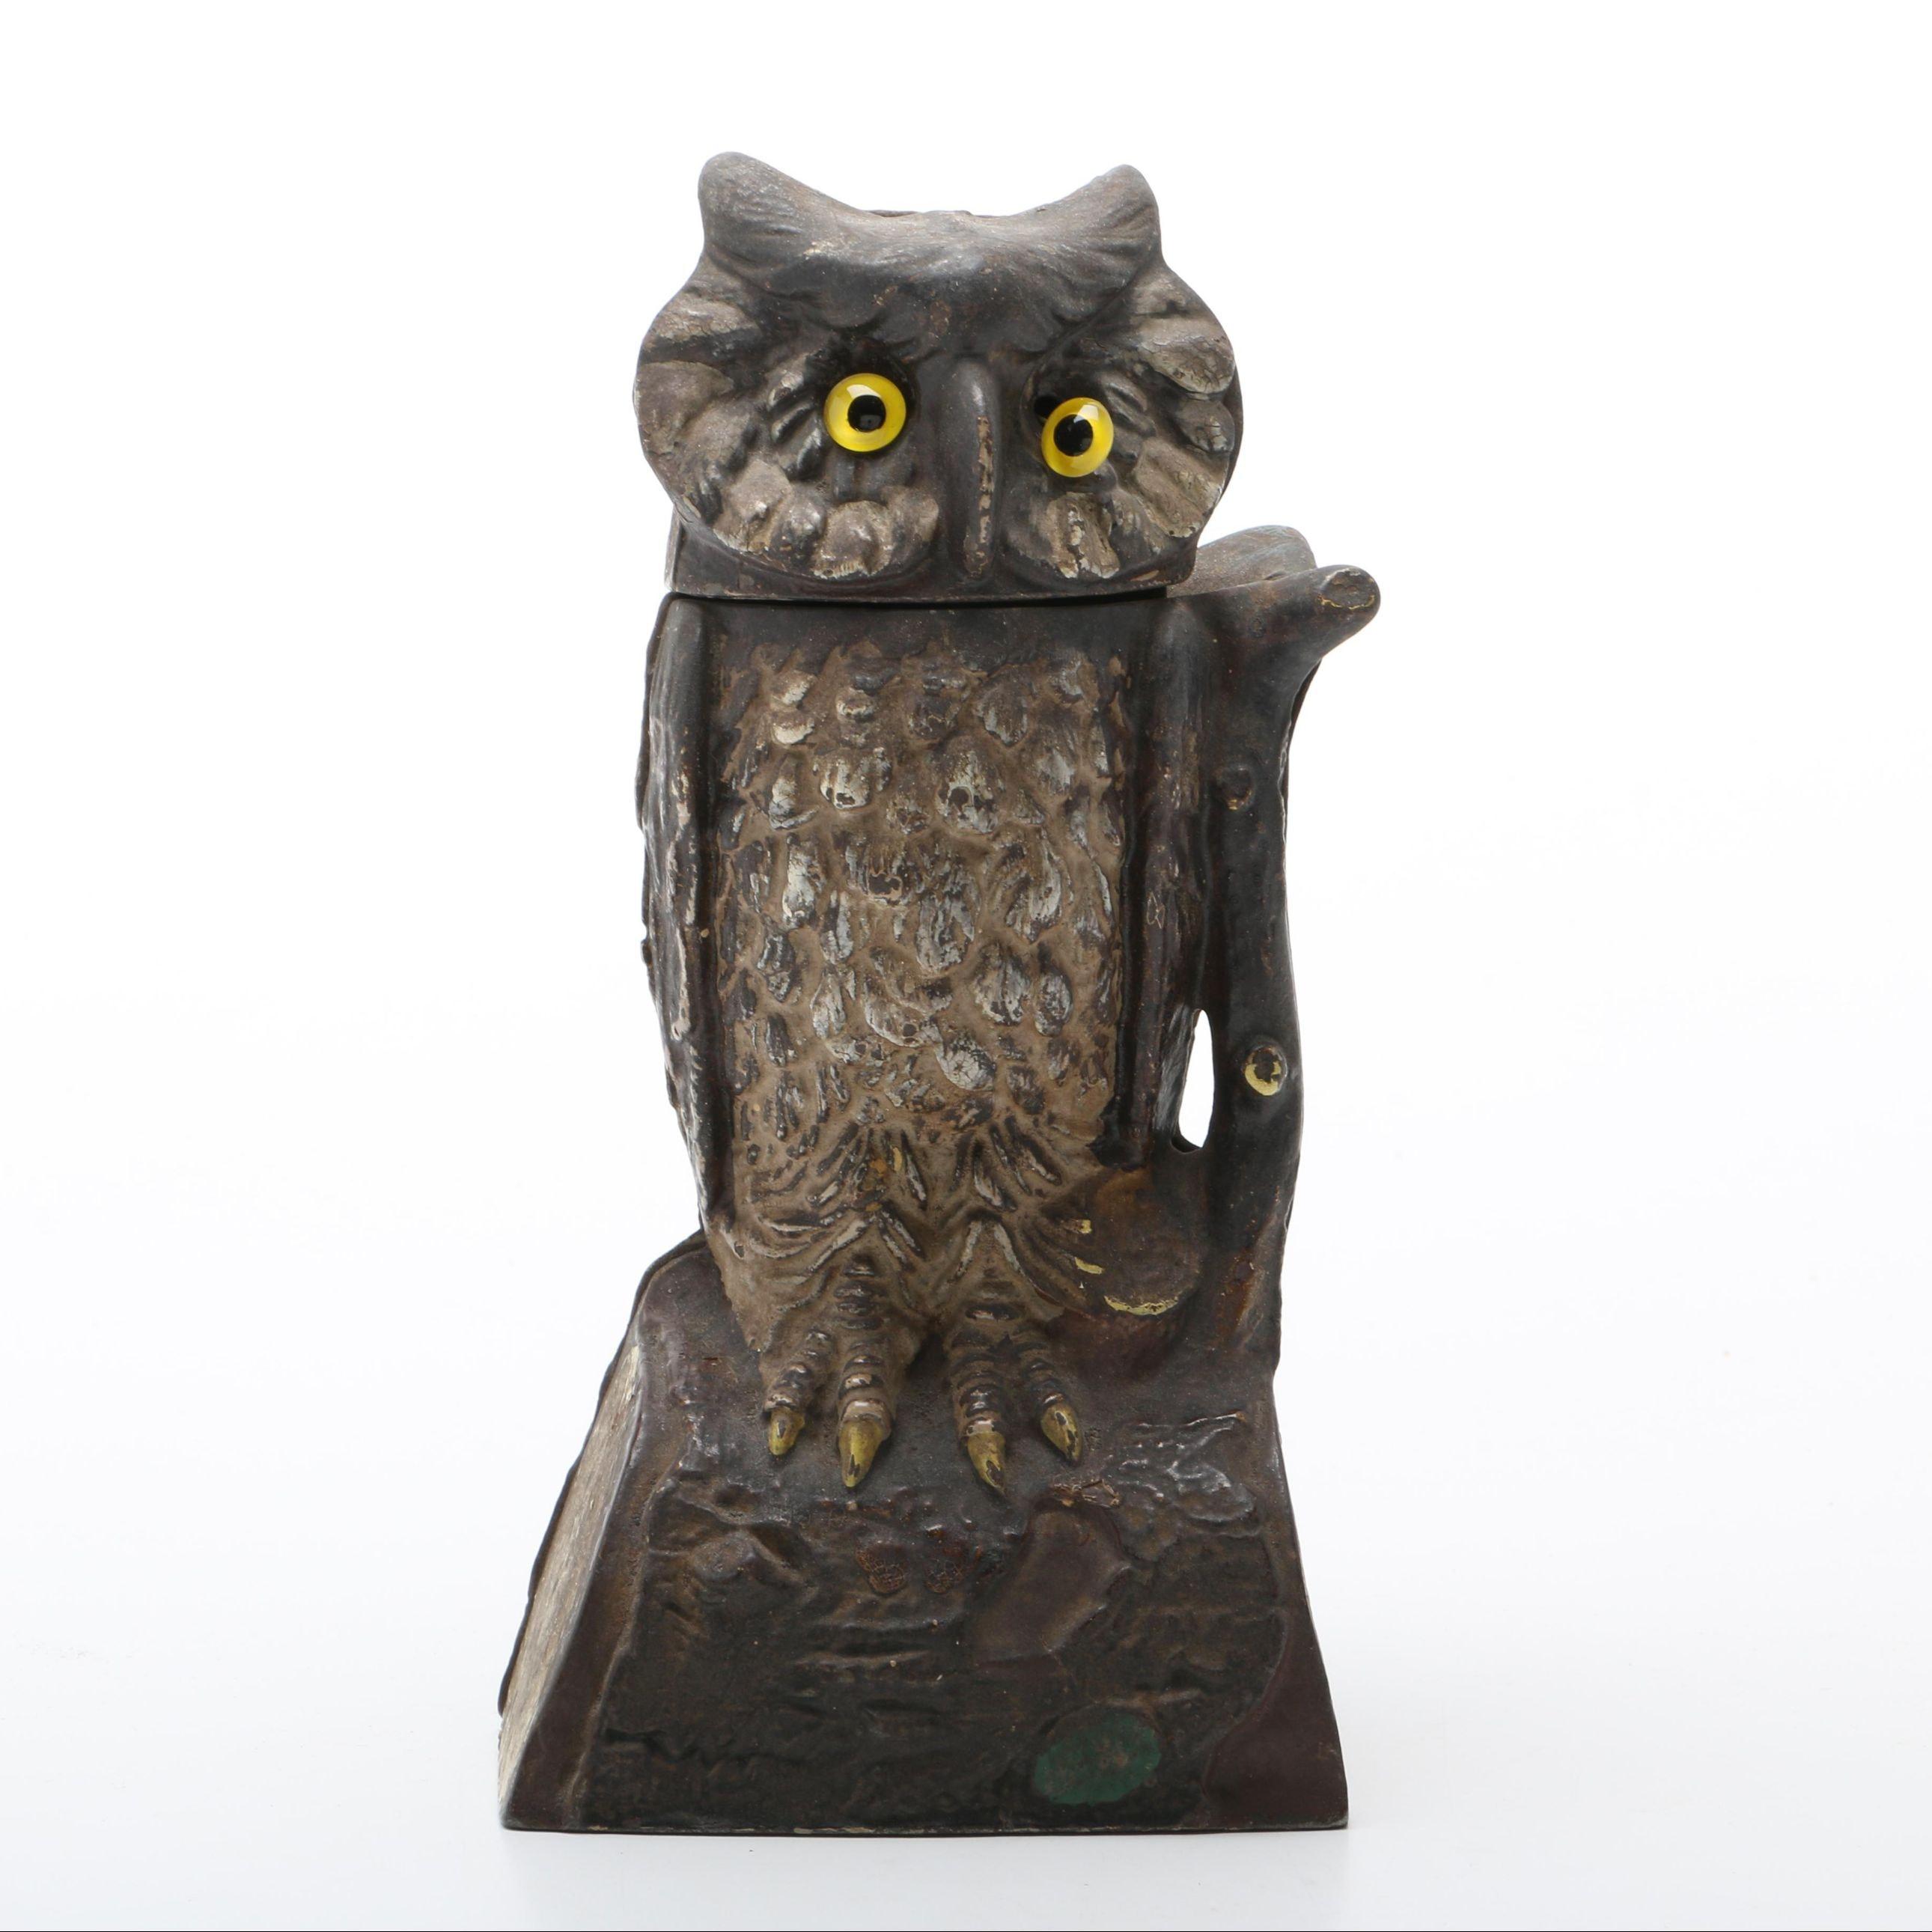 Vintage Mechanical Cast Iron Owl Bank